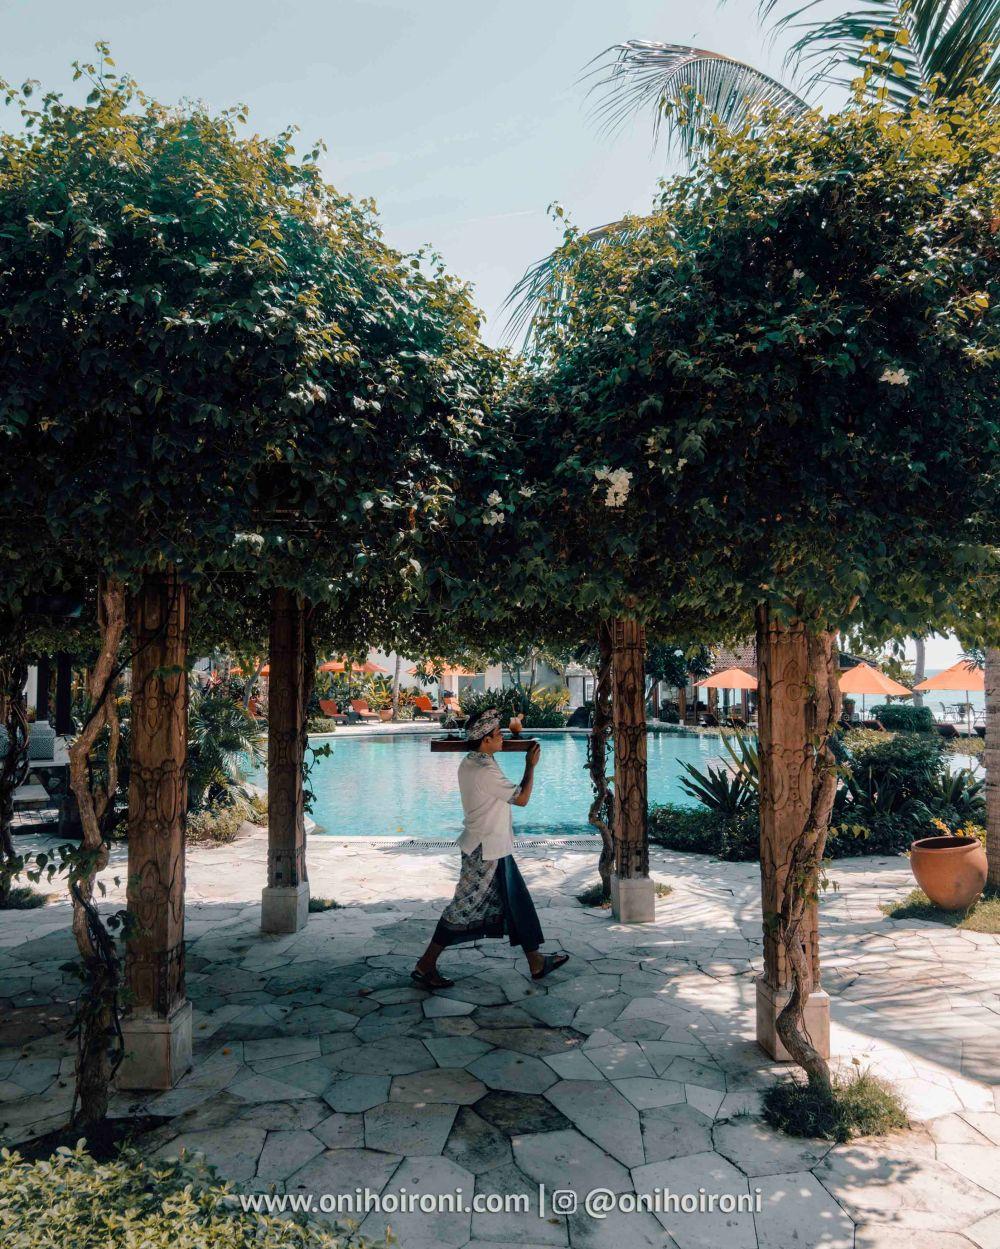 lah olah restaurant Sudamala Suites & Villas Senggigi, Lombok